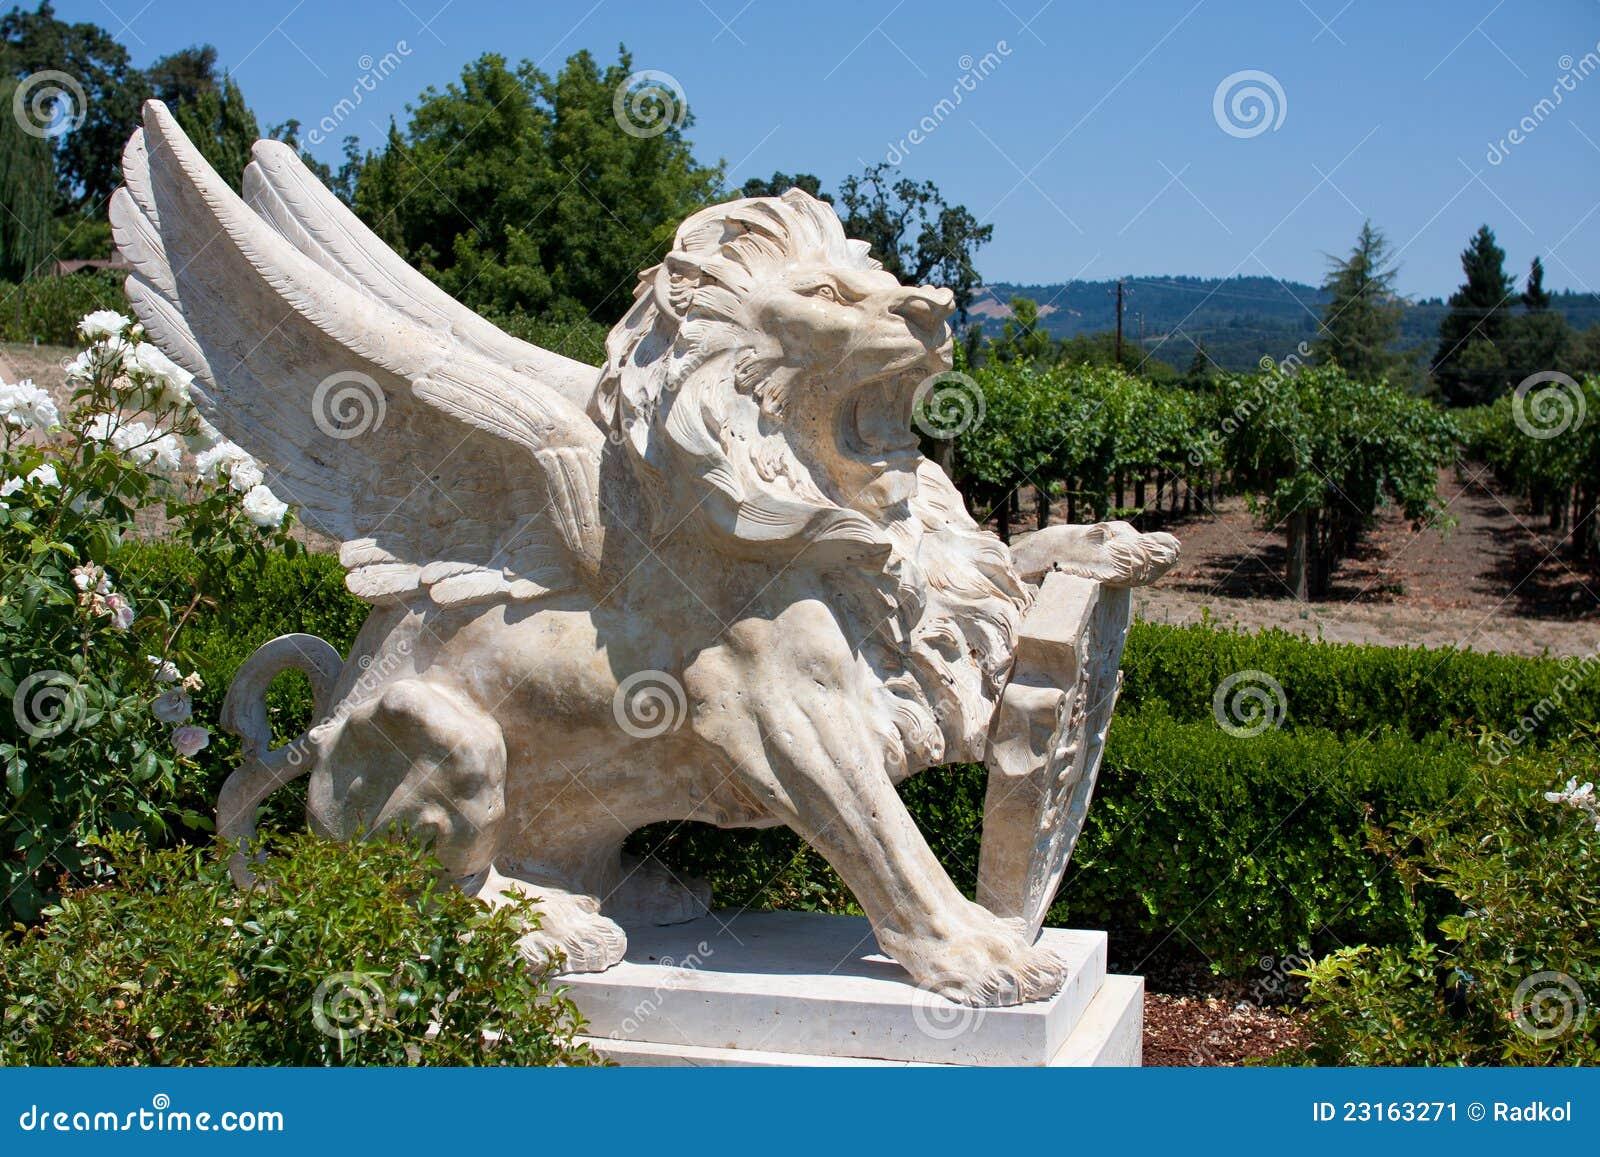 Statue of leo